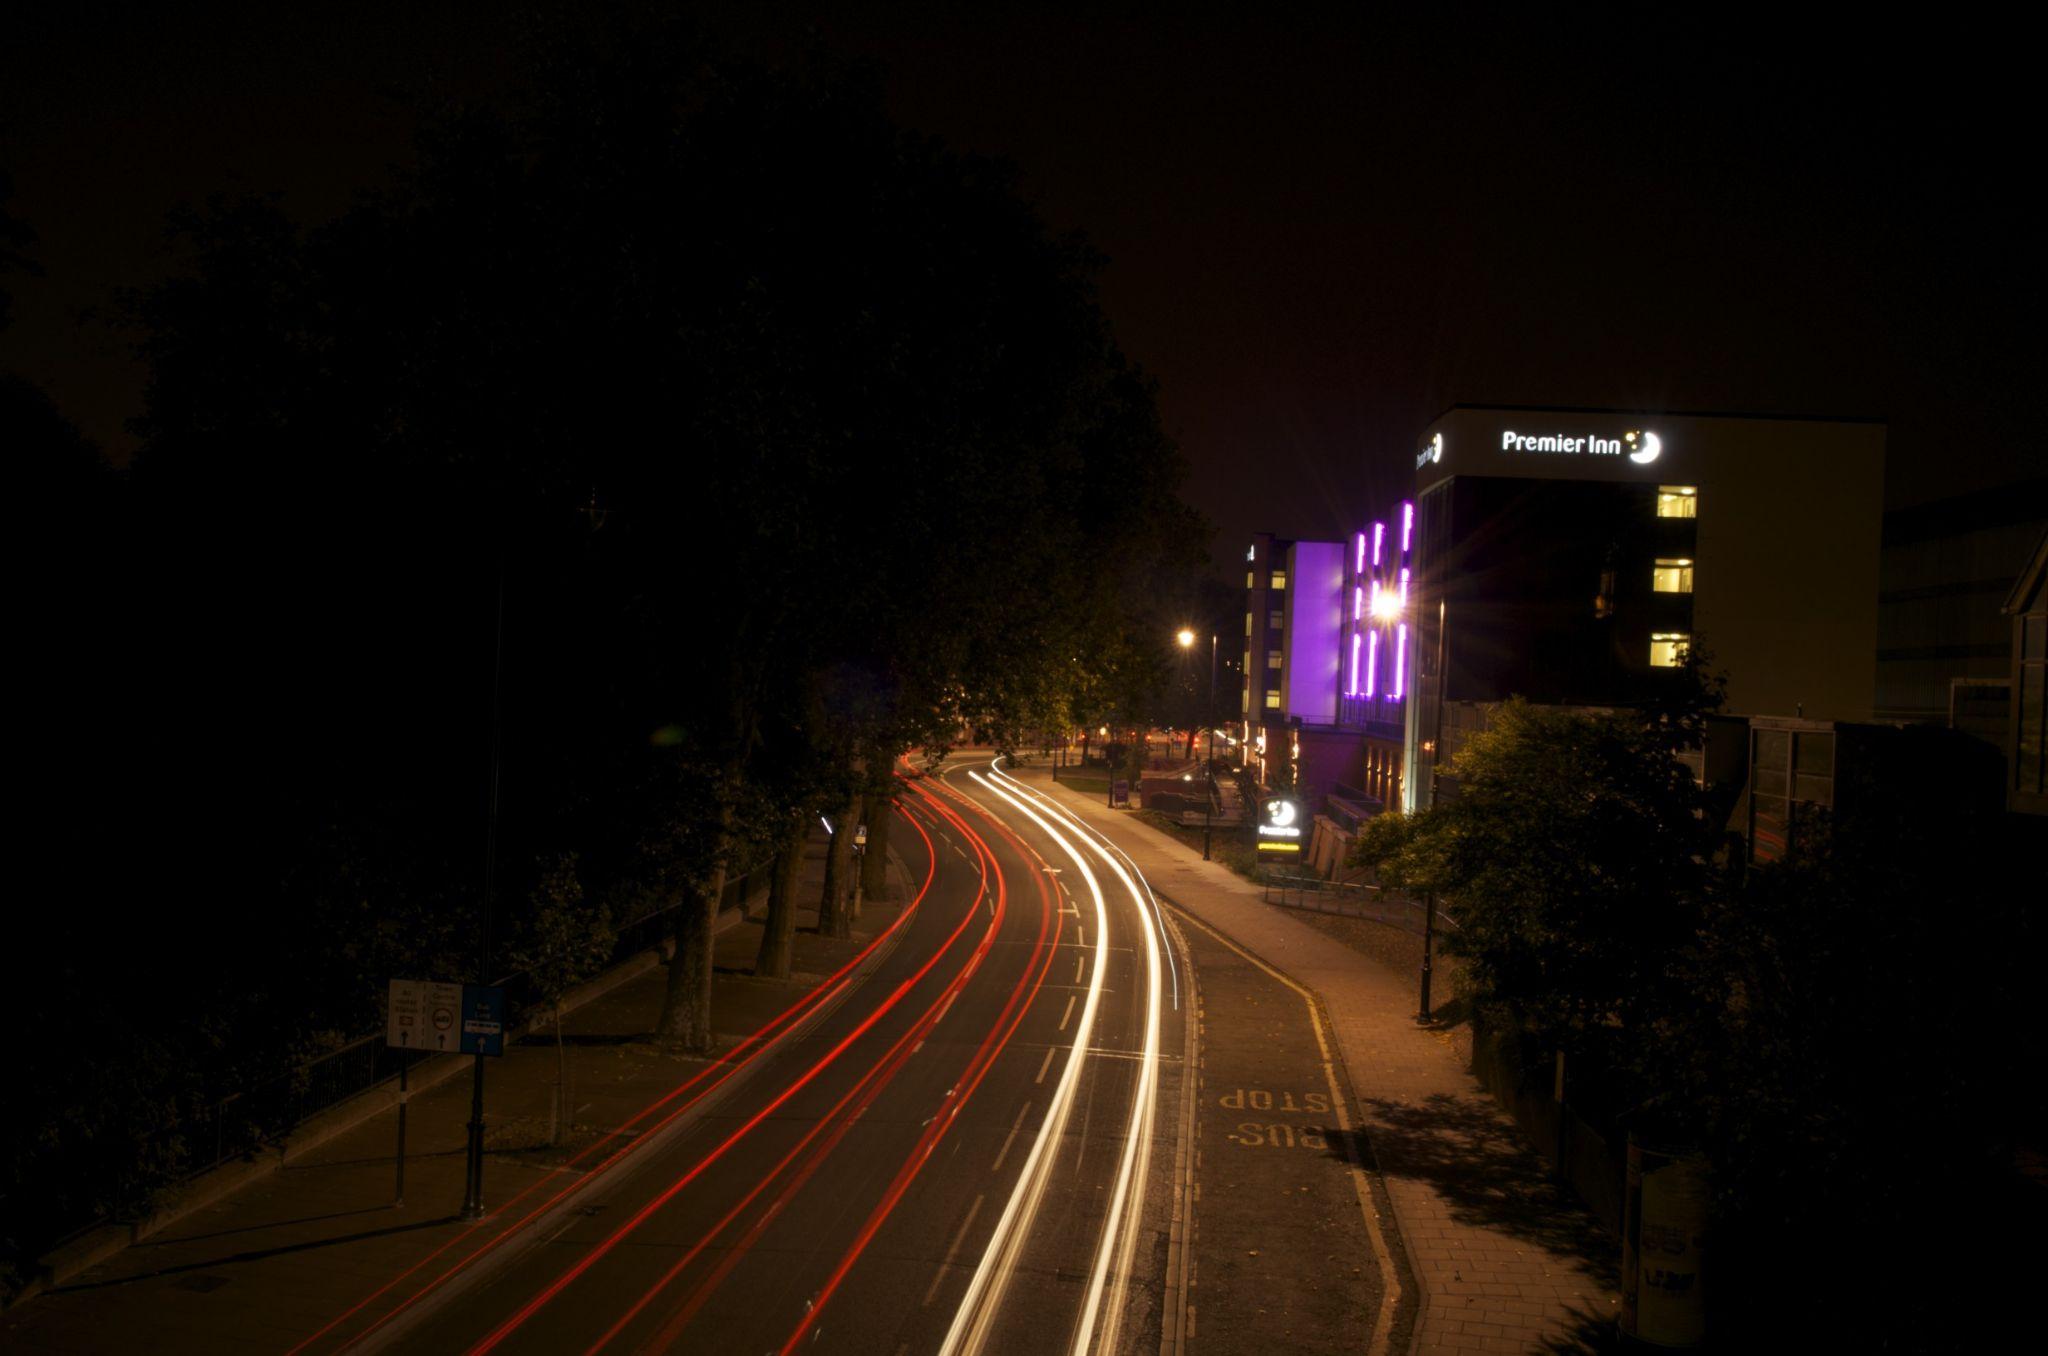 Premier Inn light trails by Rob Williams